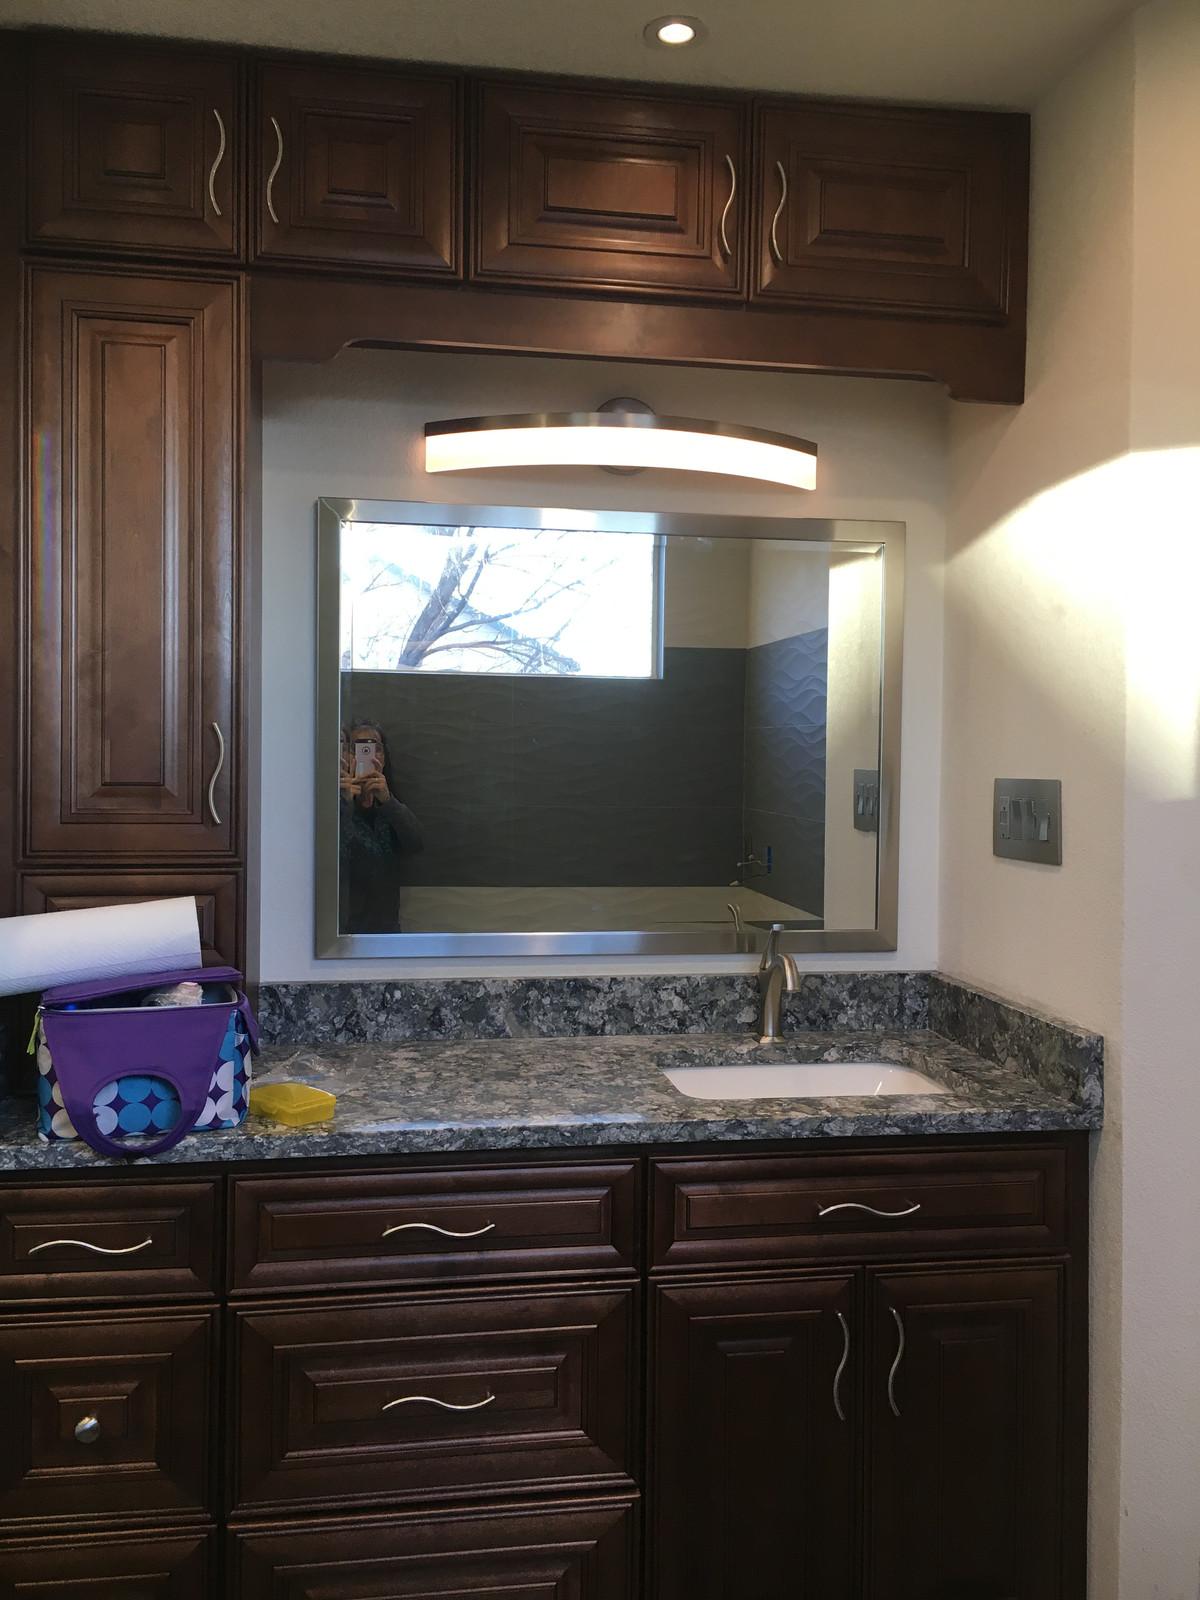 LEGACY KITCHEN & FLOORING | Cabinets Hardwood Granite Tile ...